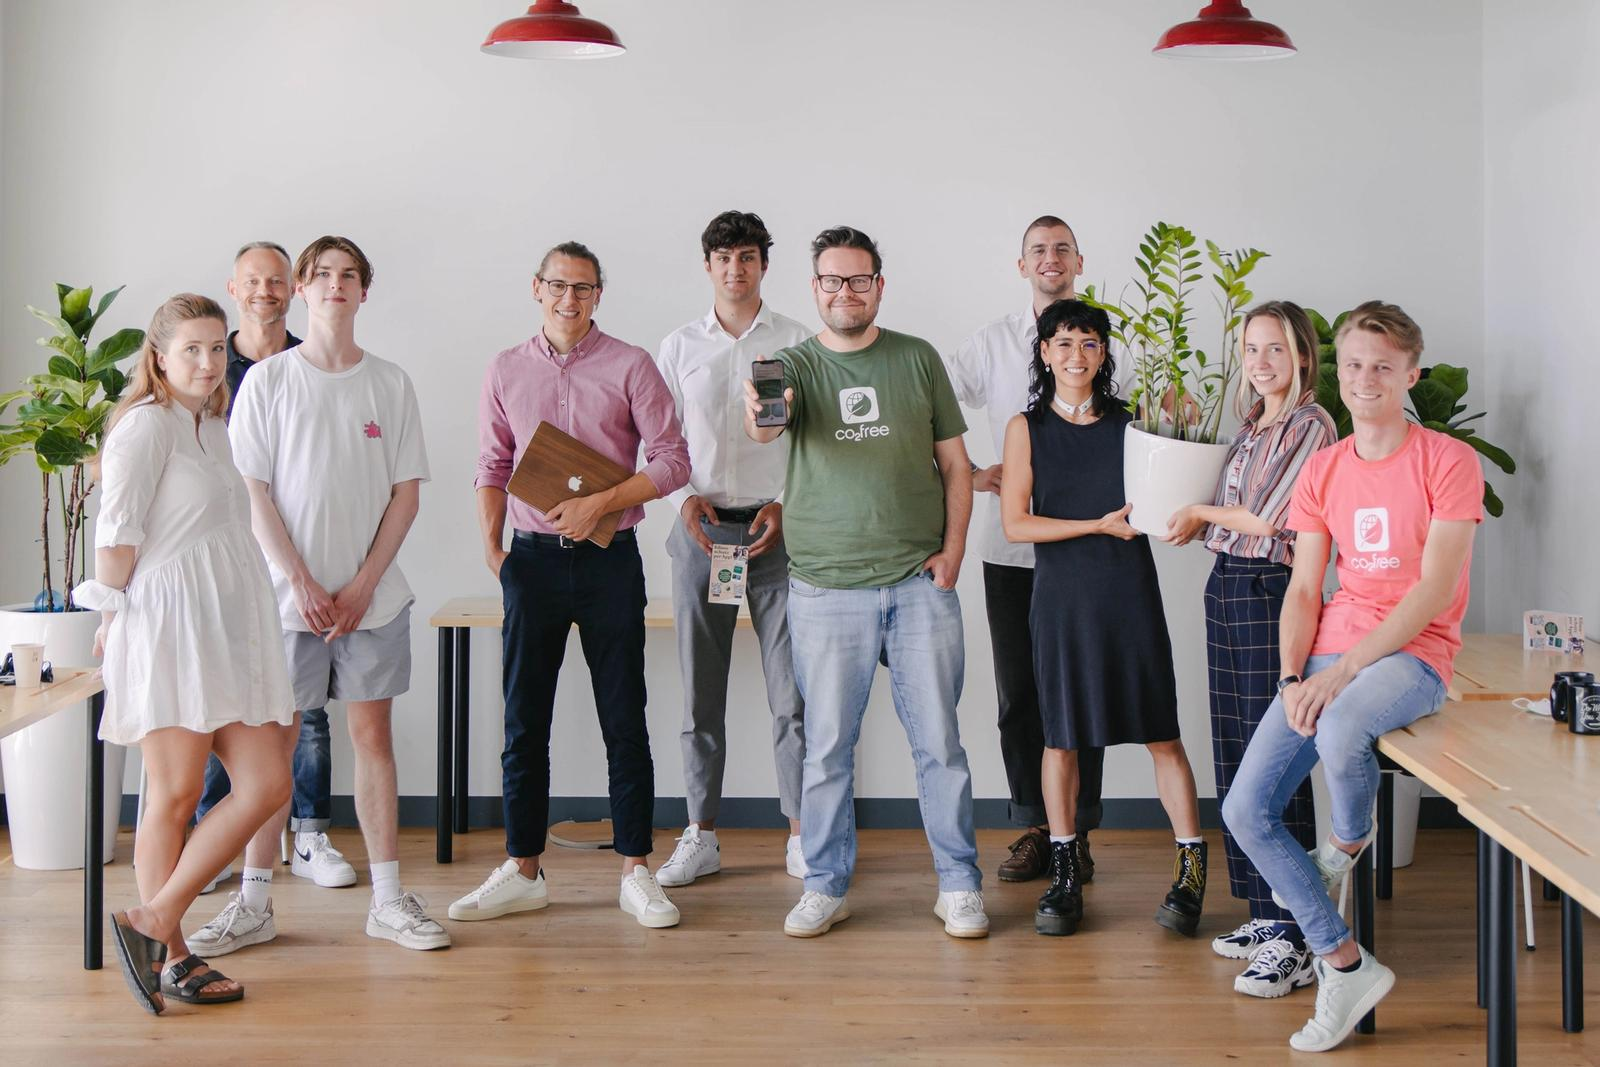 CO2free team